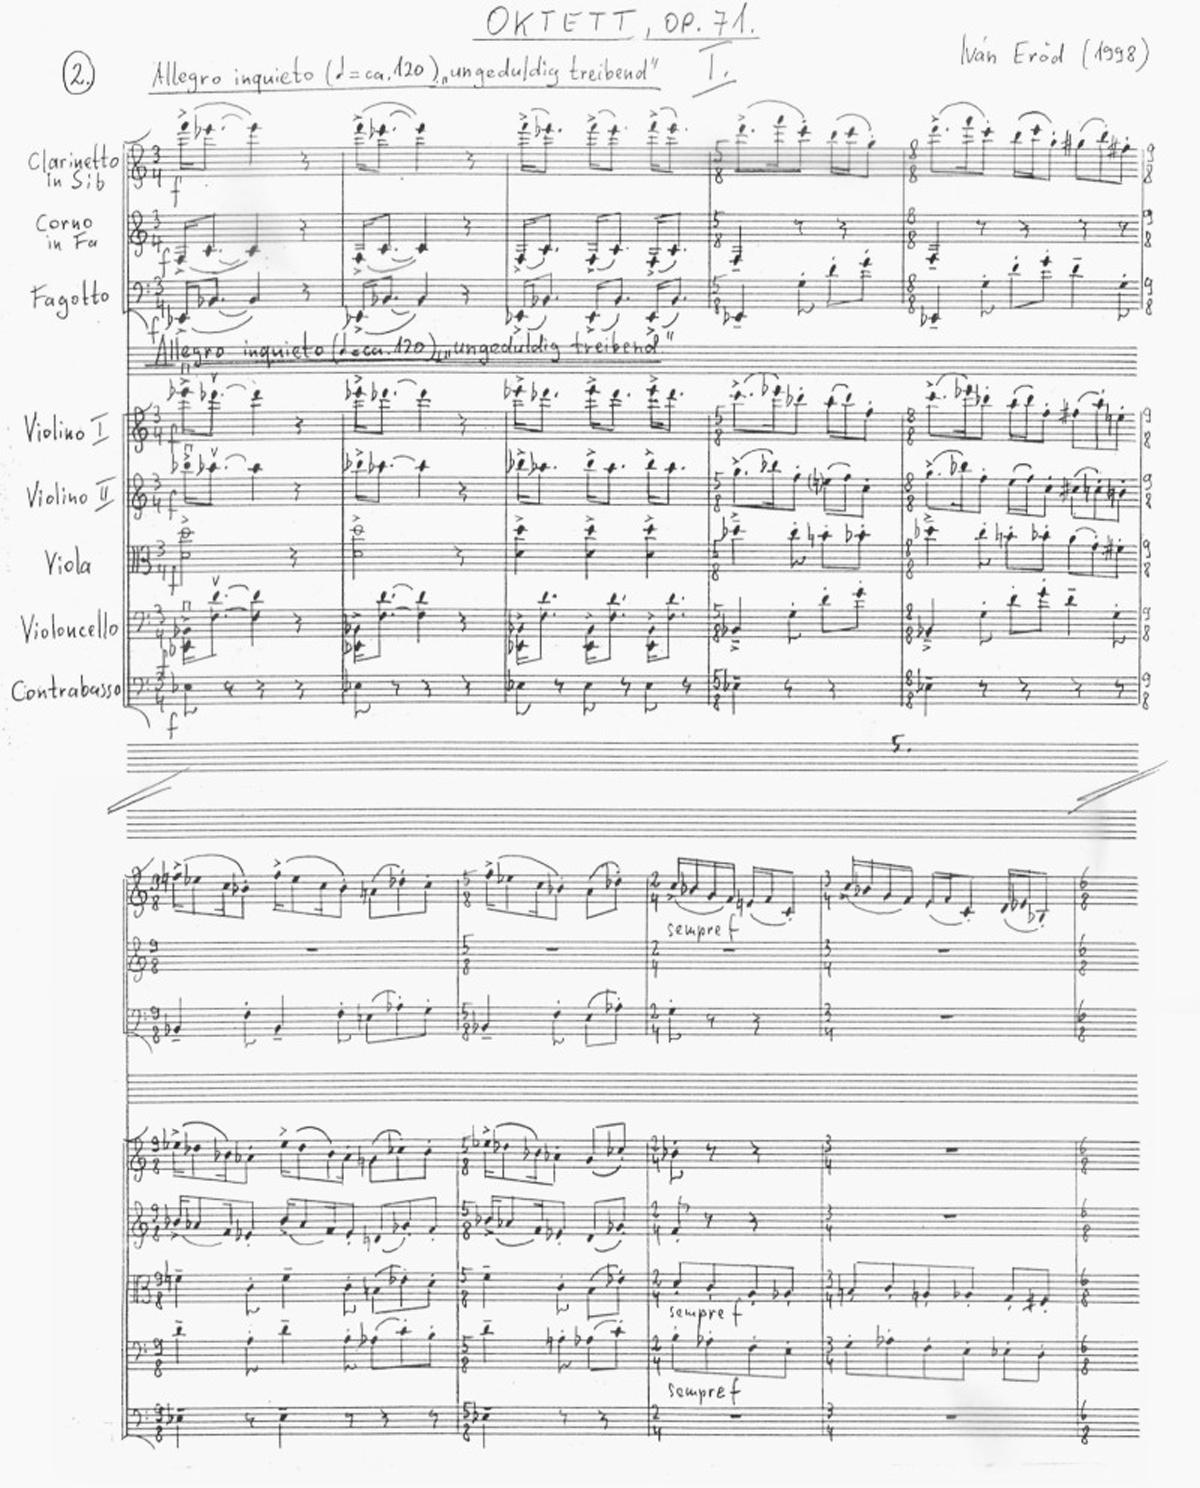 Ivan Eröd, Manuskript – Oktett Op. 71 / © Musikverlag Doblinger, abgebildet mit freundicher Genehmigung des Verlages